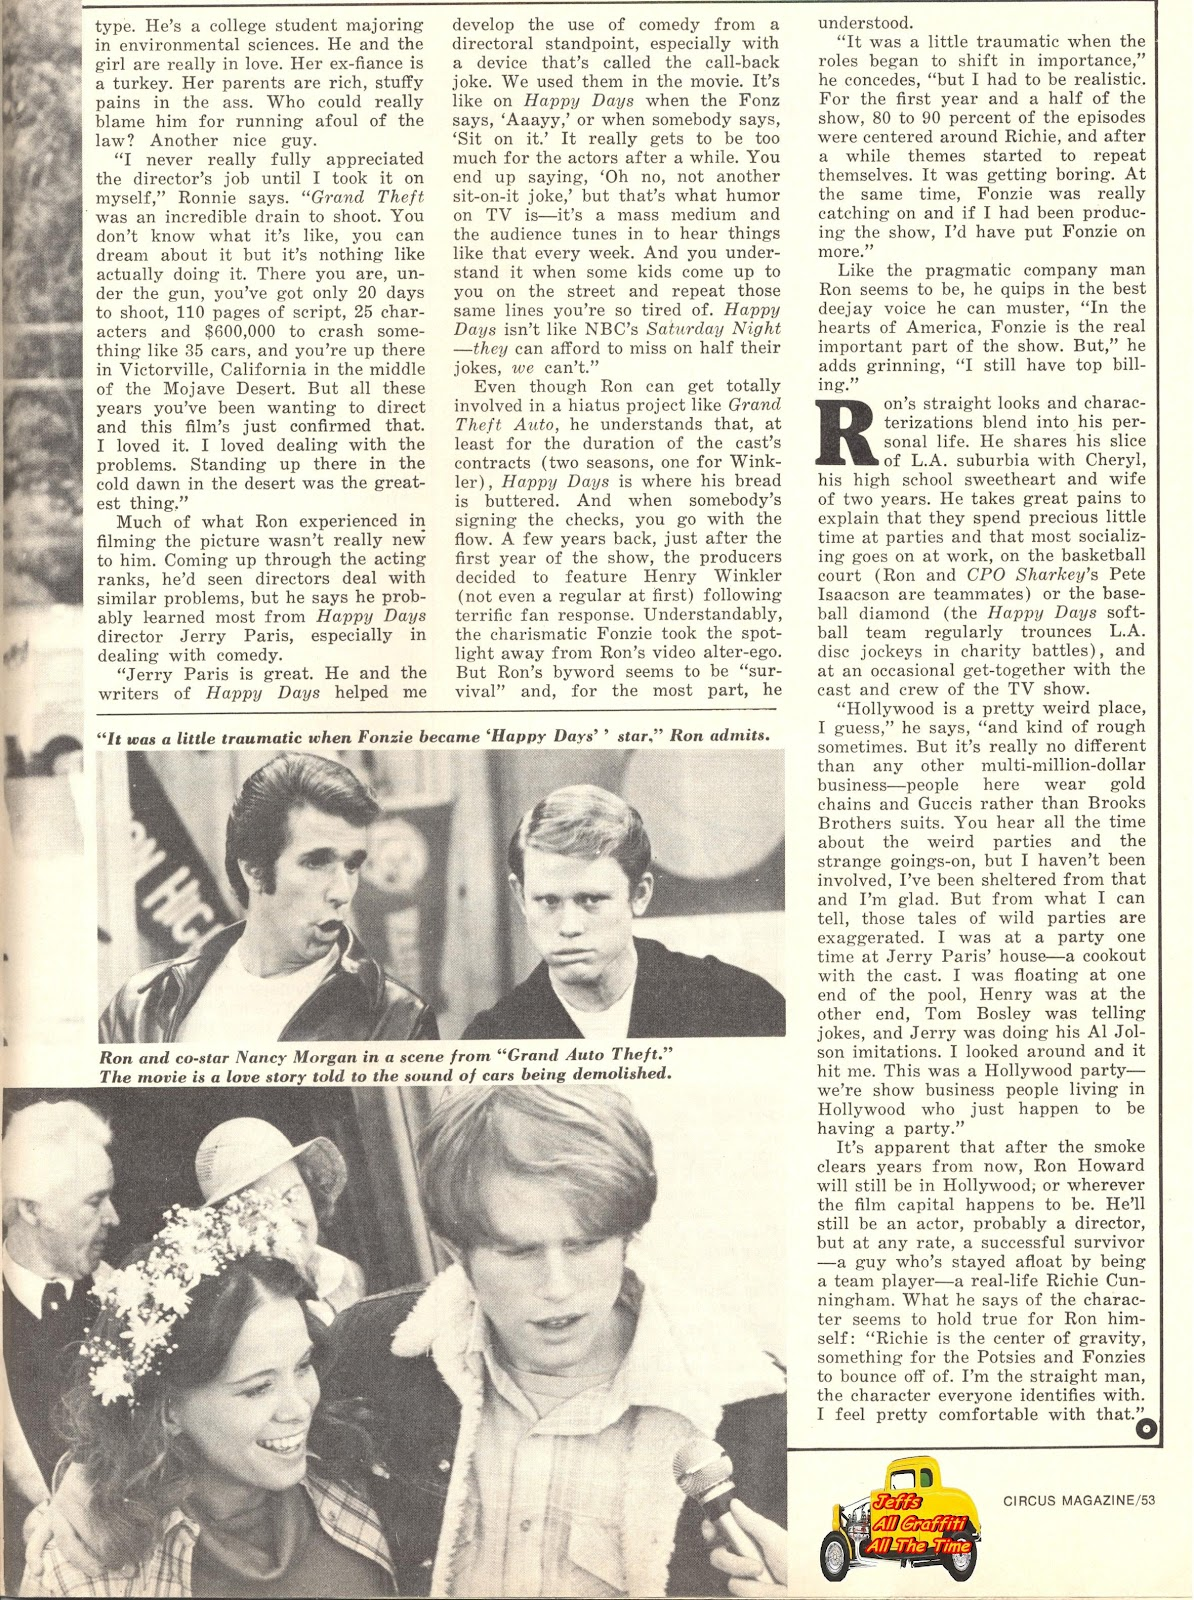 Time Magazine 1977 August 29 Underclass Ervil LeBaron Elvis Presley Ballooning